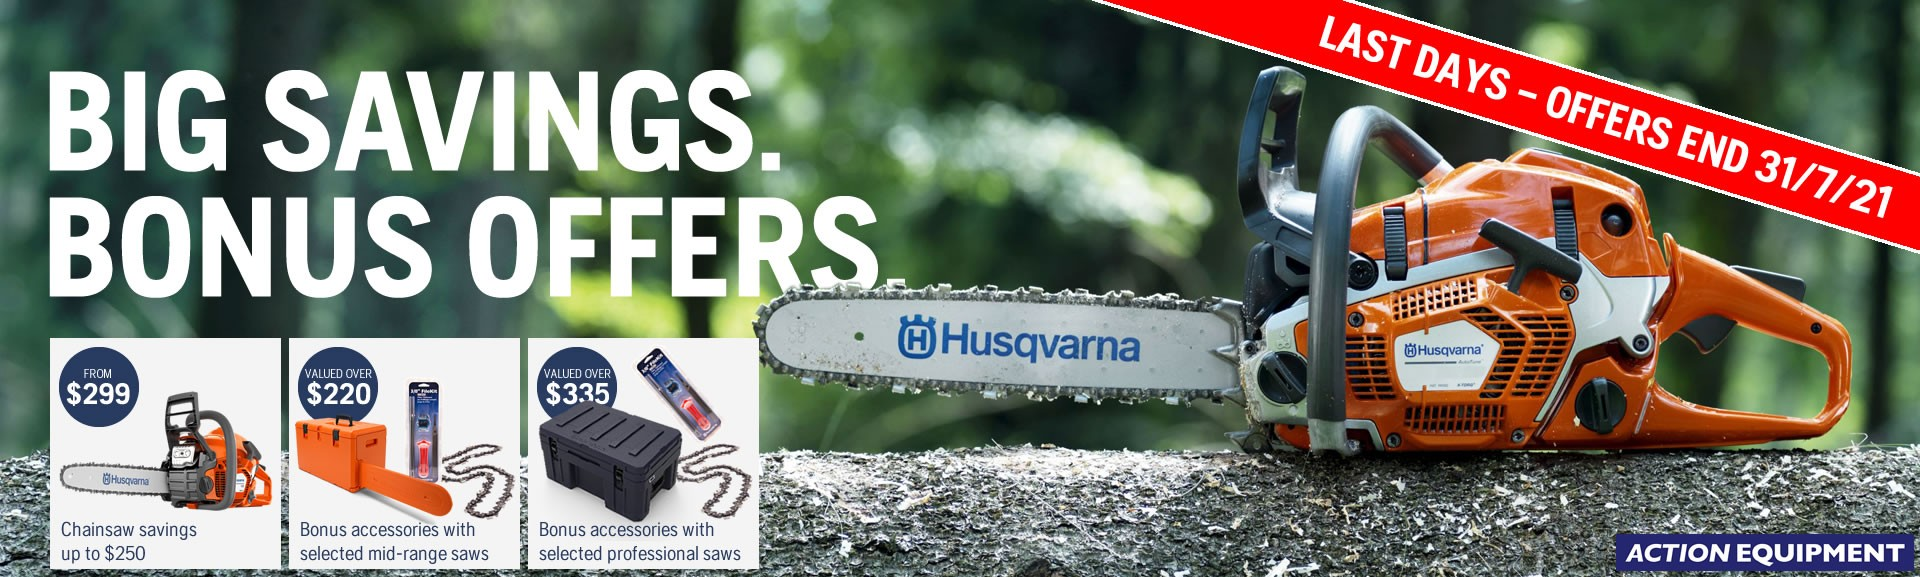 Husqvarna chainsaw offers